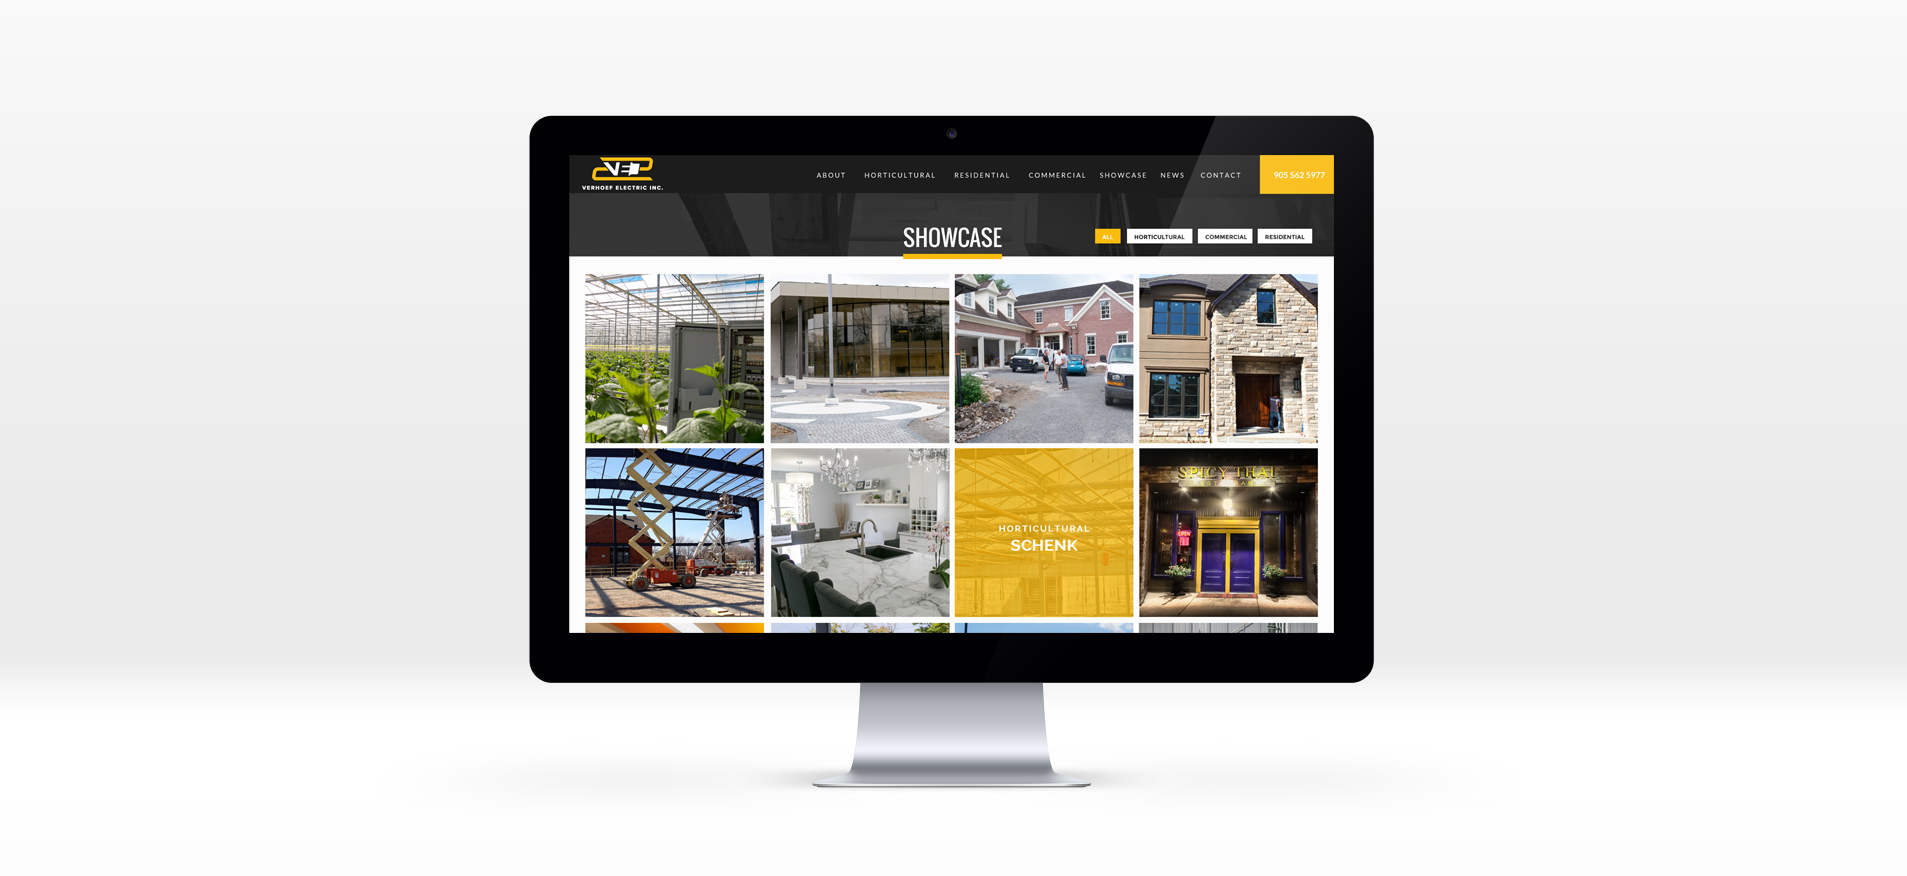 Verhoef Electric Inc. Second Image